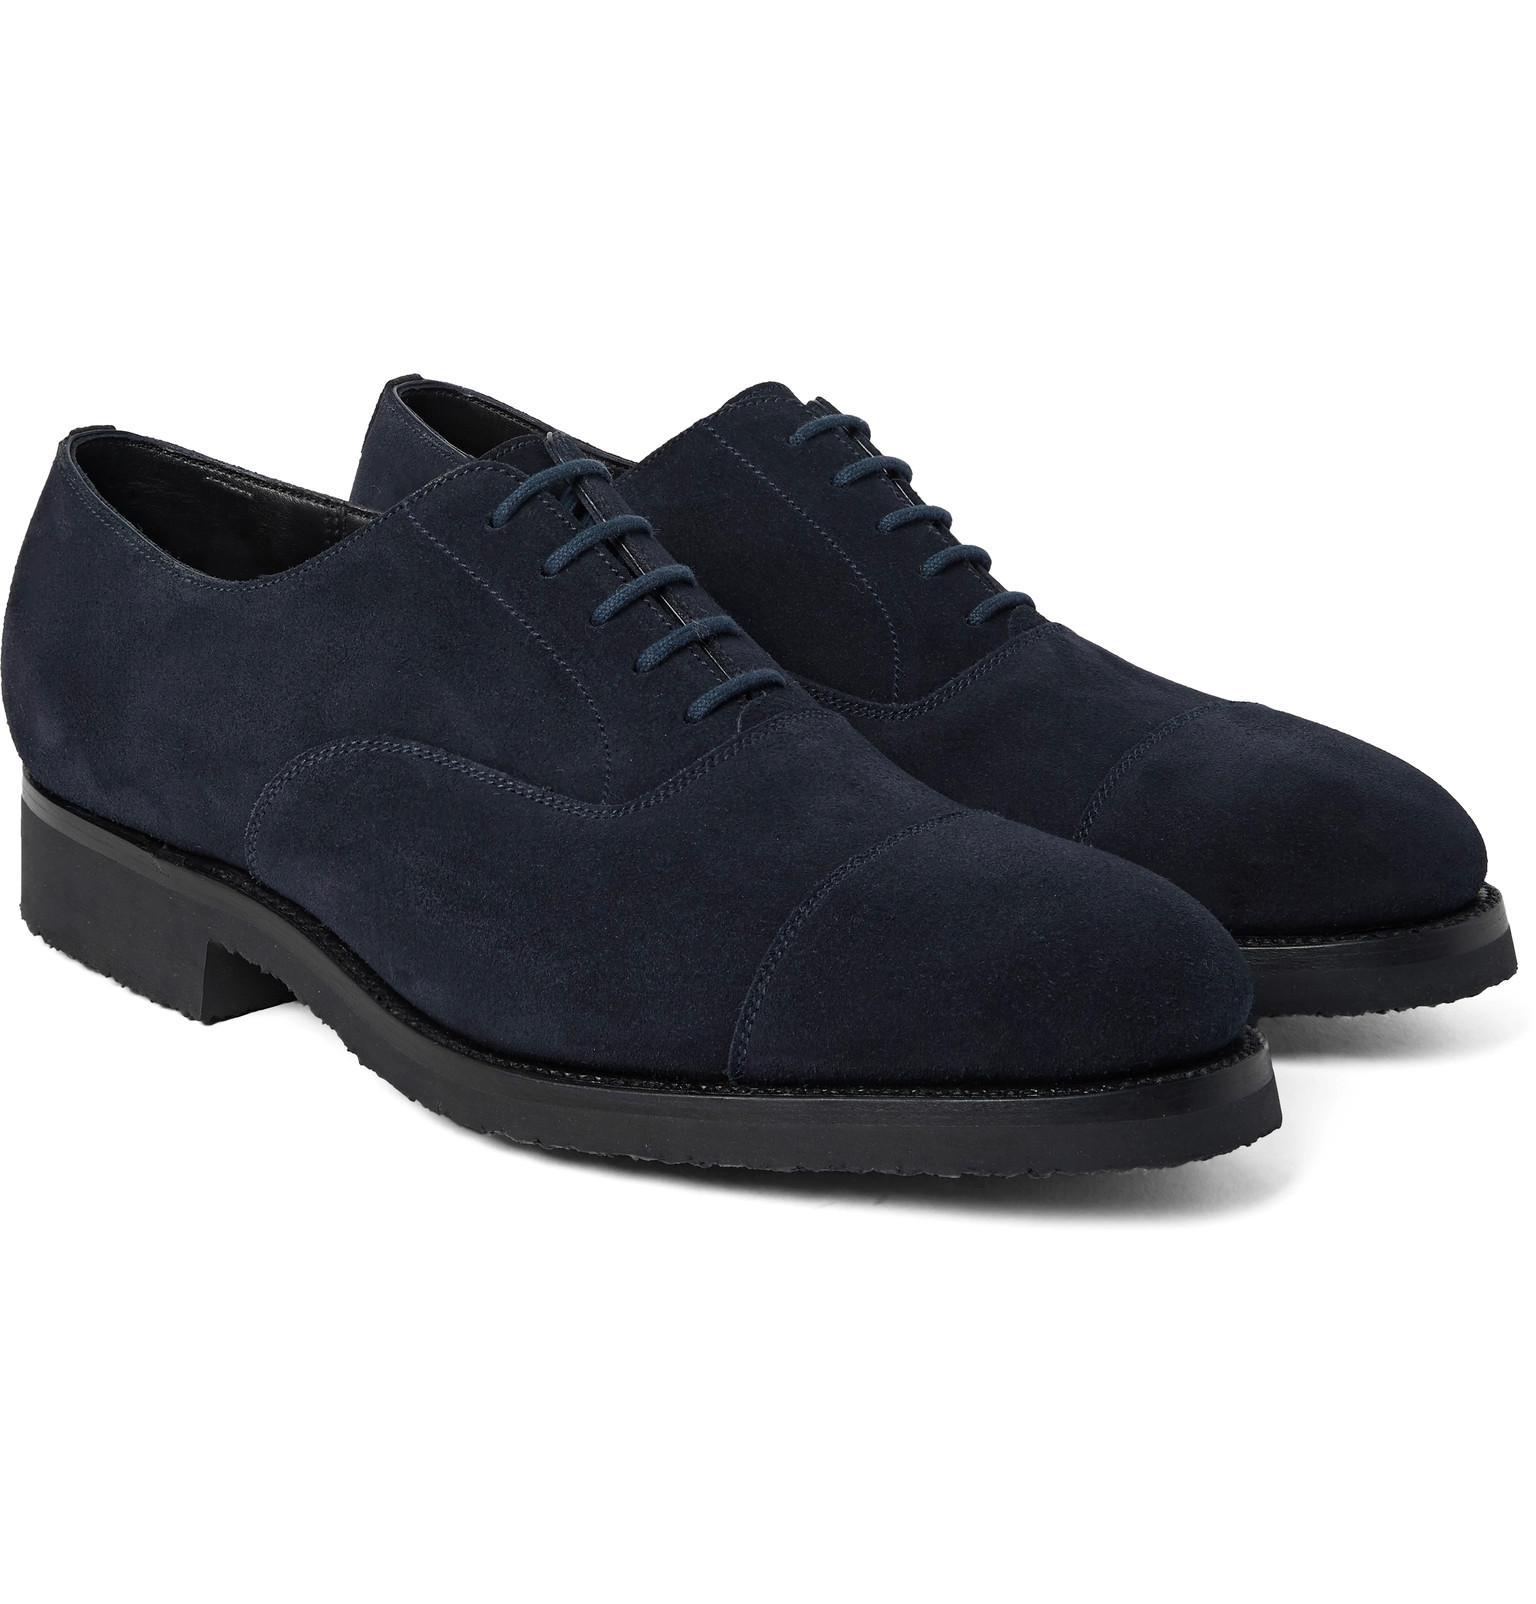 Mens Blue Suede Casual Shoes